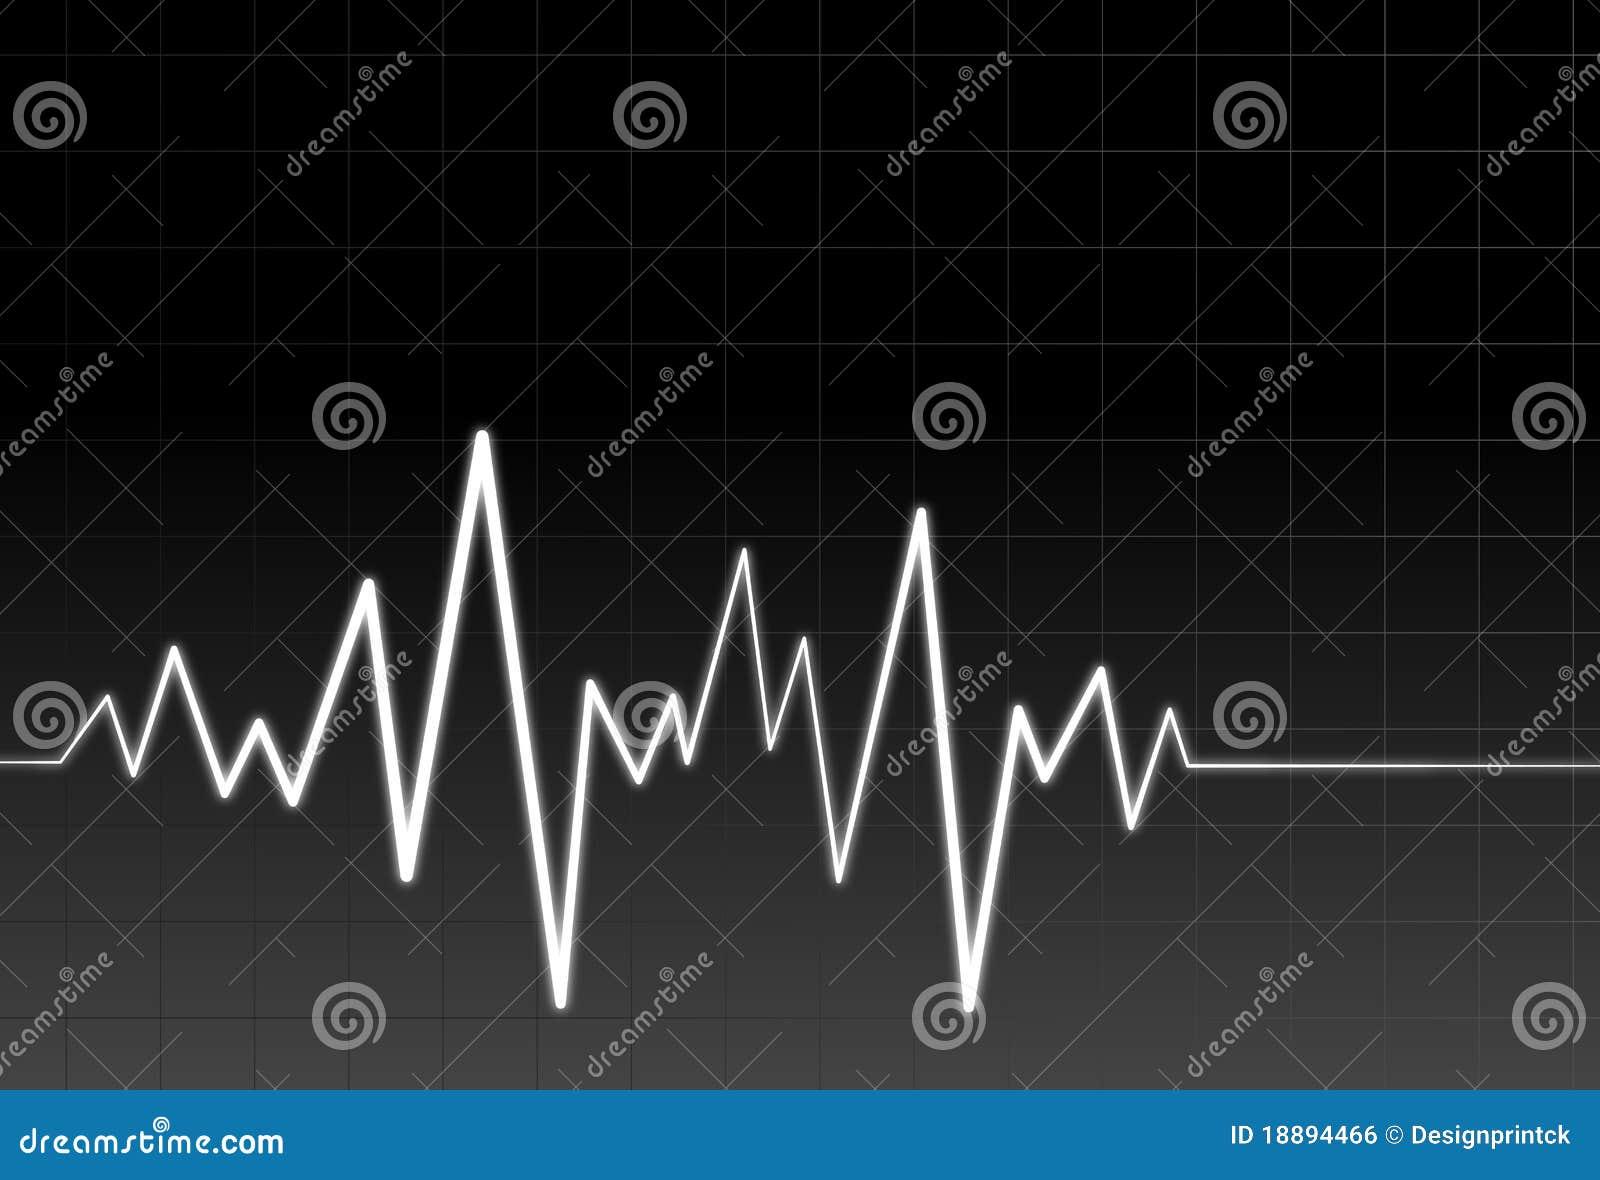 Neon audio or pulse wave